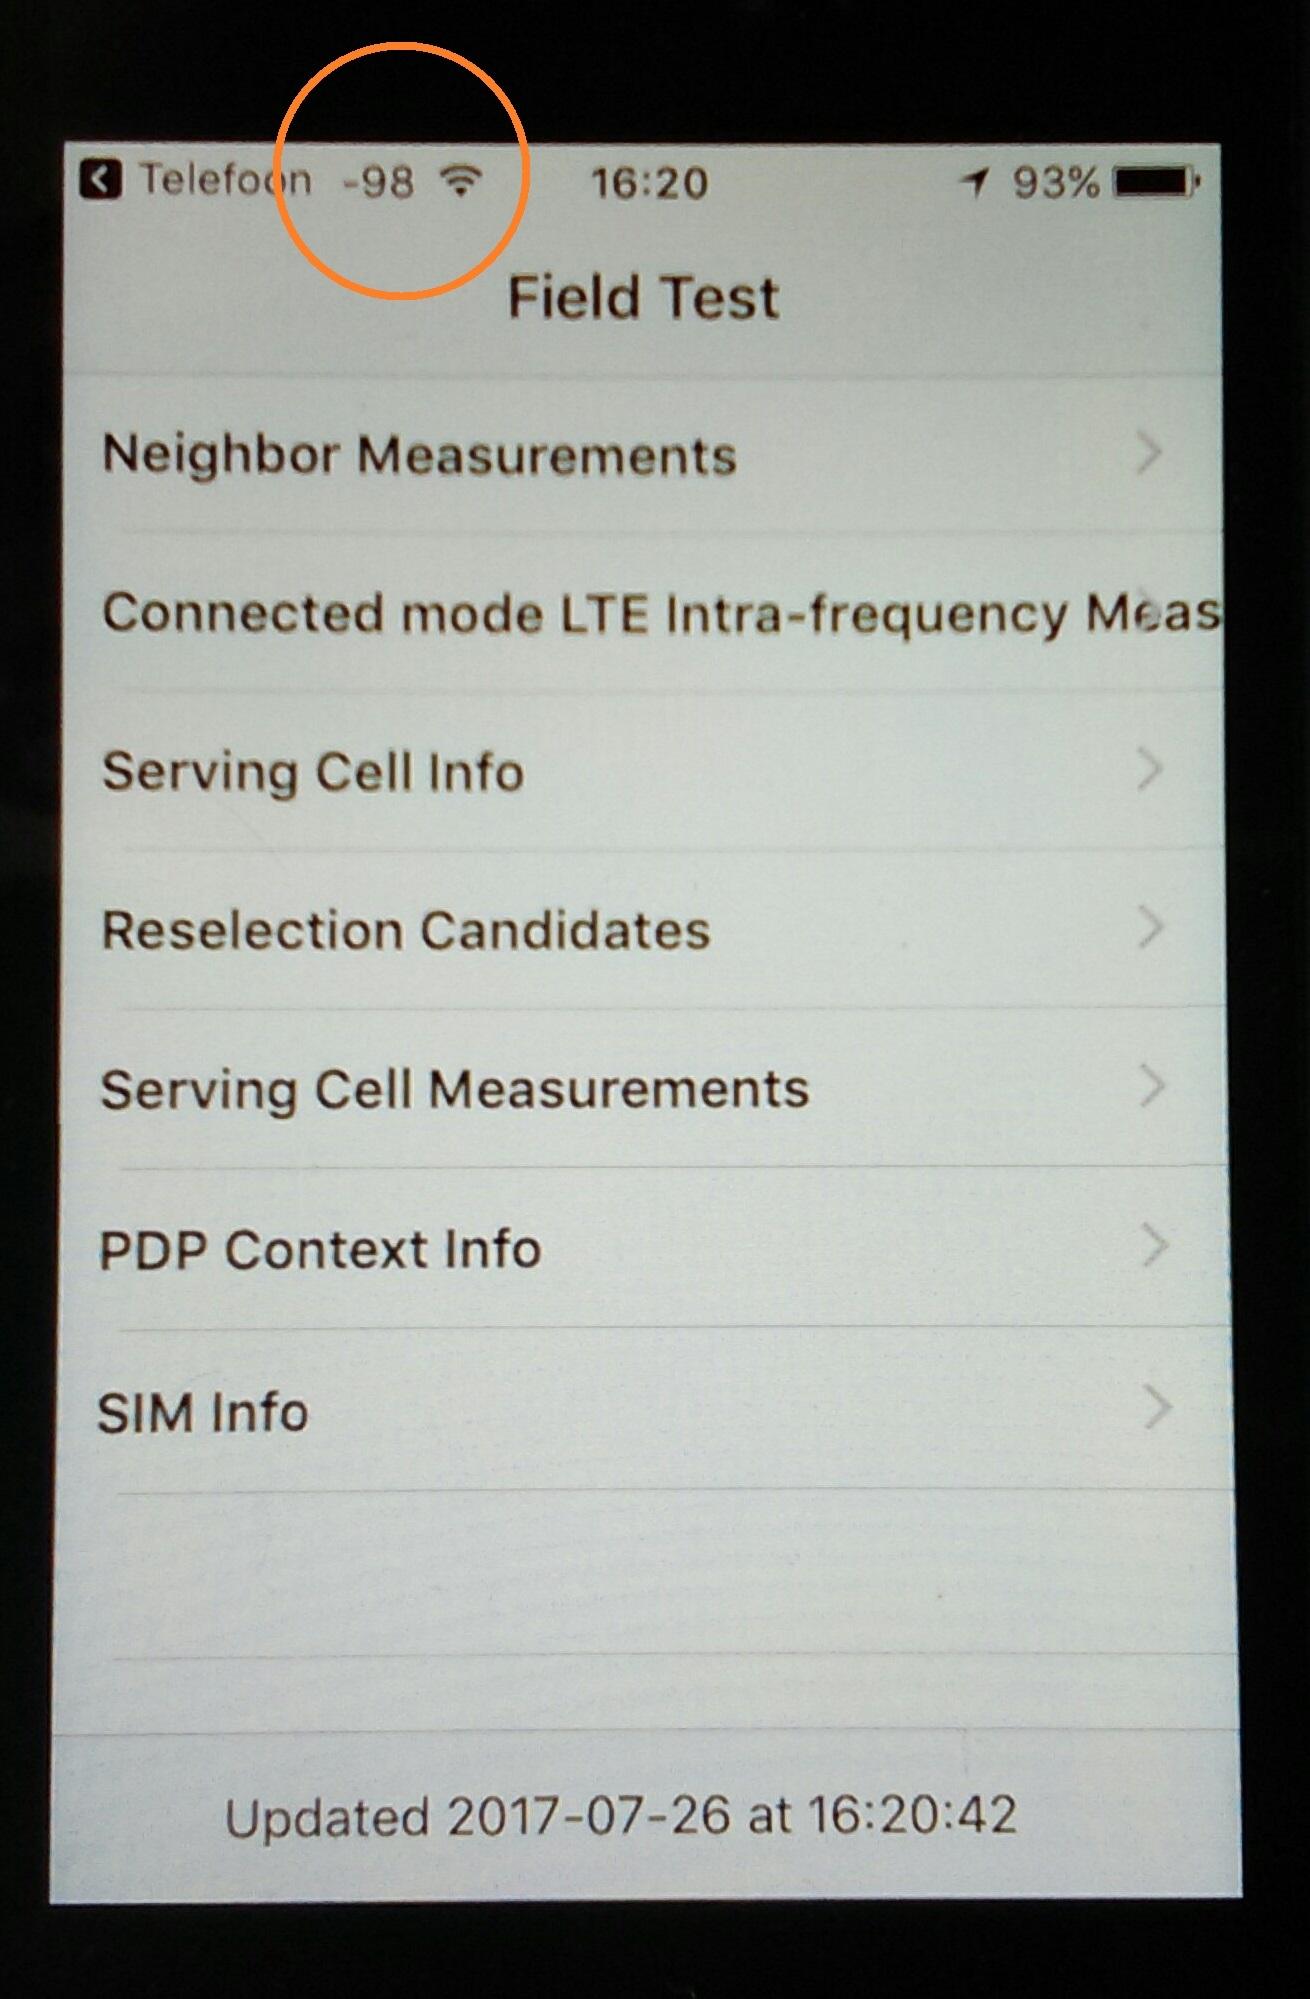 iPhone field measurement screen display